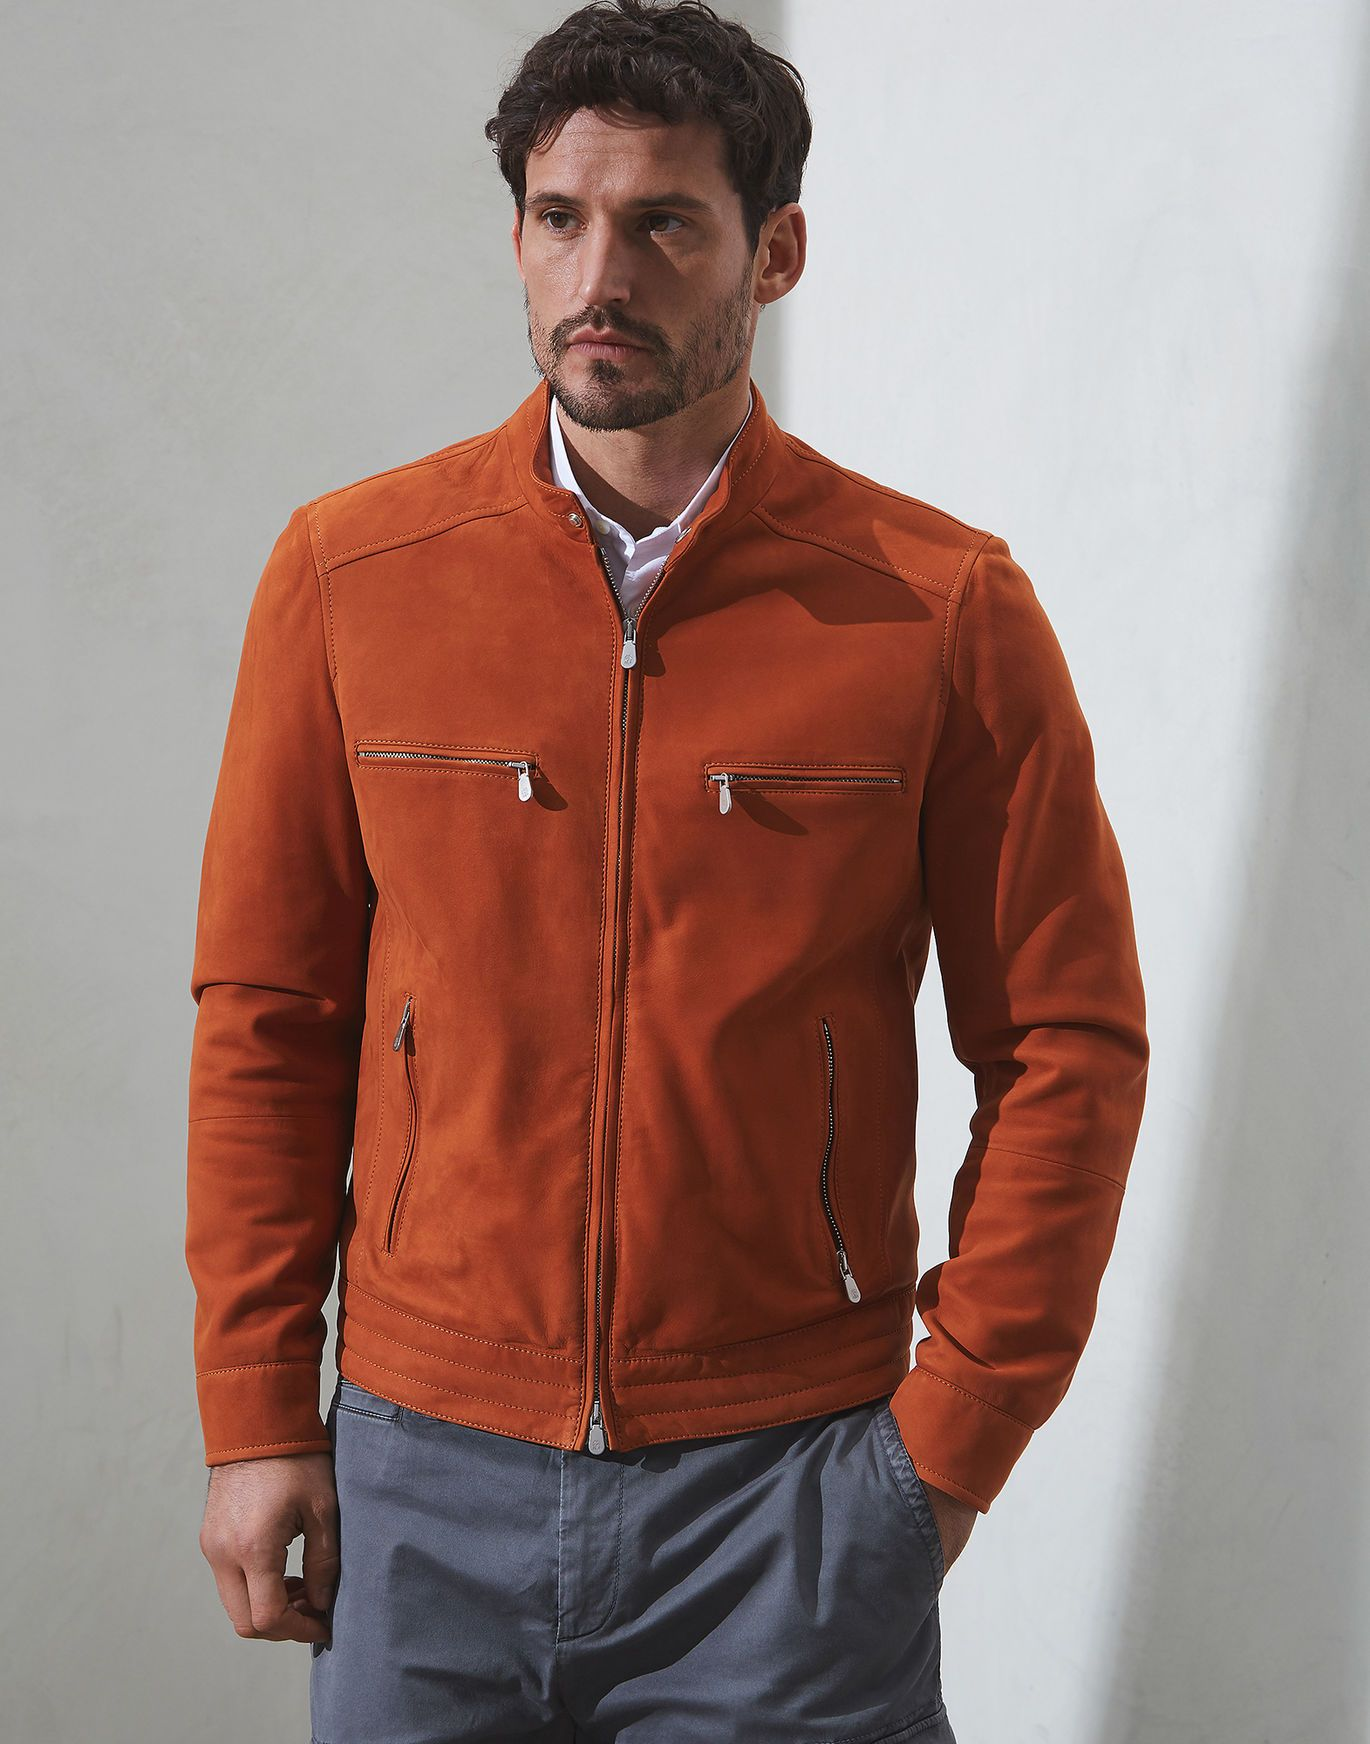 Brunello Cucinelli Red Leather Jacket Leather Jacket Jackets [ 1744 x 1370 Pixel ]